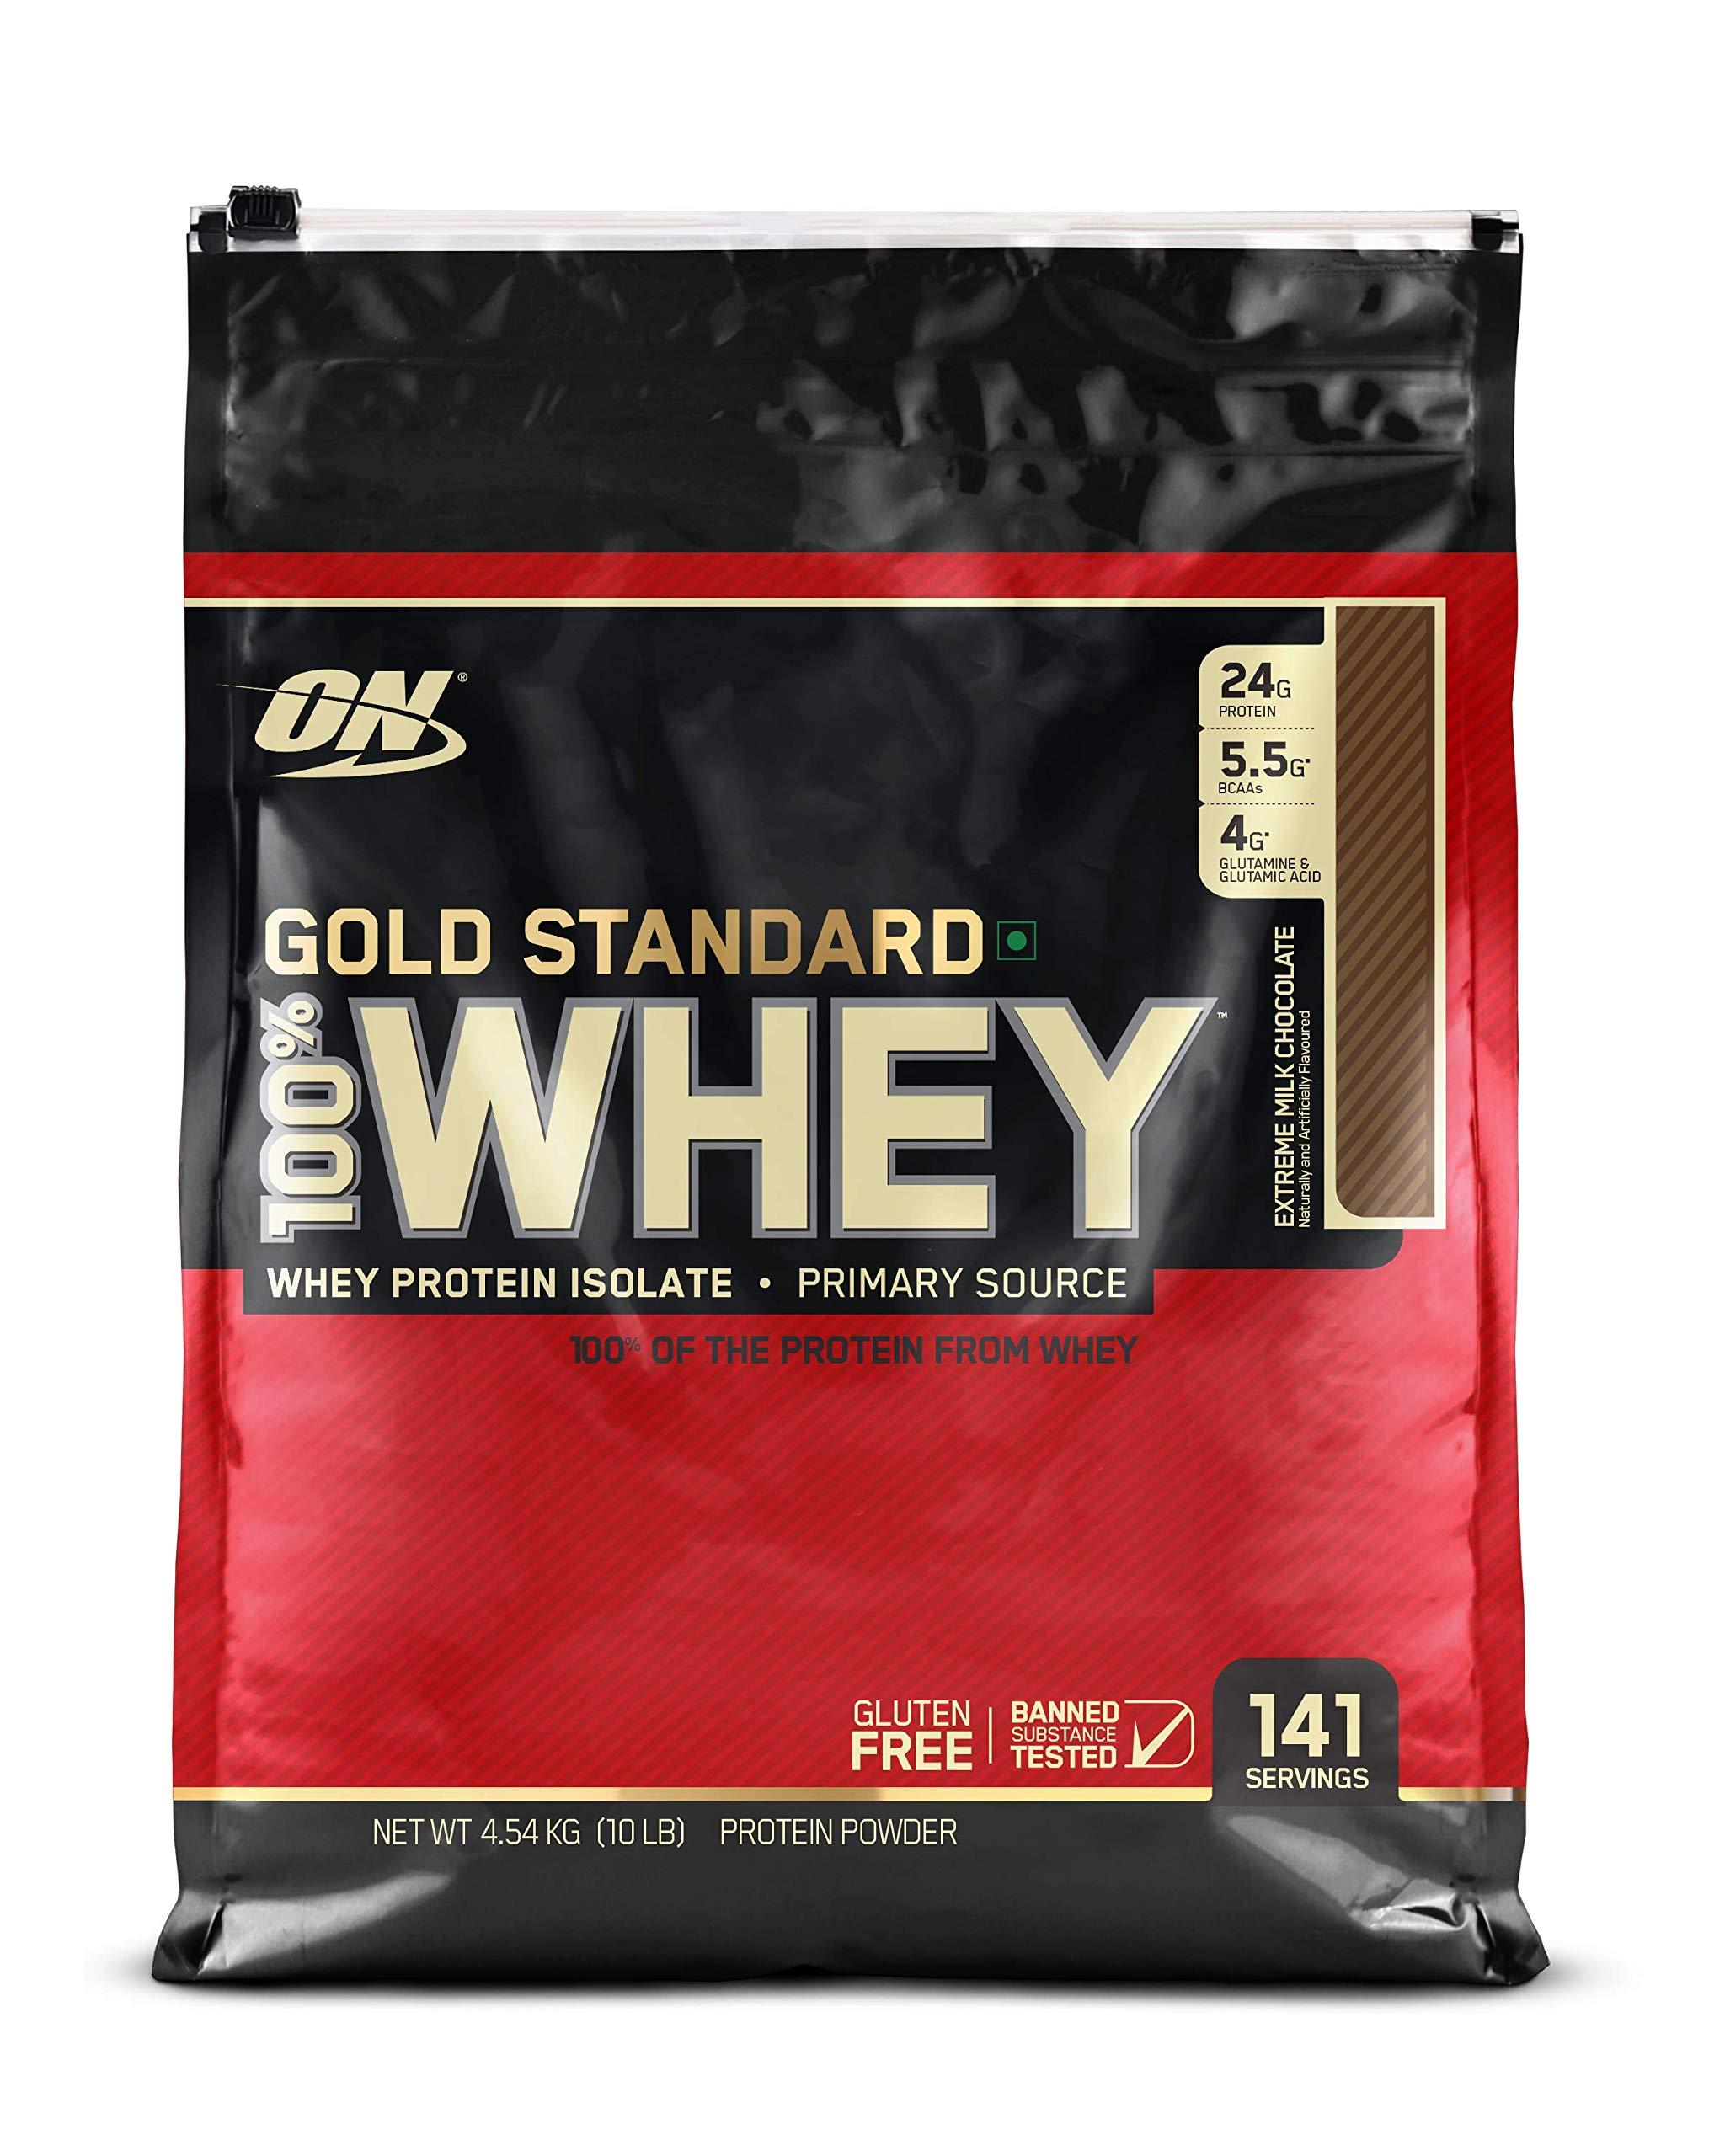 OPTIMUM NUTRITION GOLD STANDARD 100% Whey Protein Powder, Extreme Milk Chocolate, 10 Pound by Optimum Nutrition (Image #1)